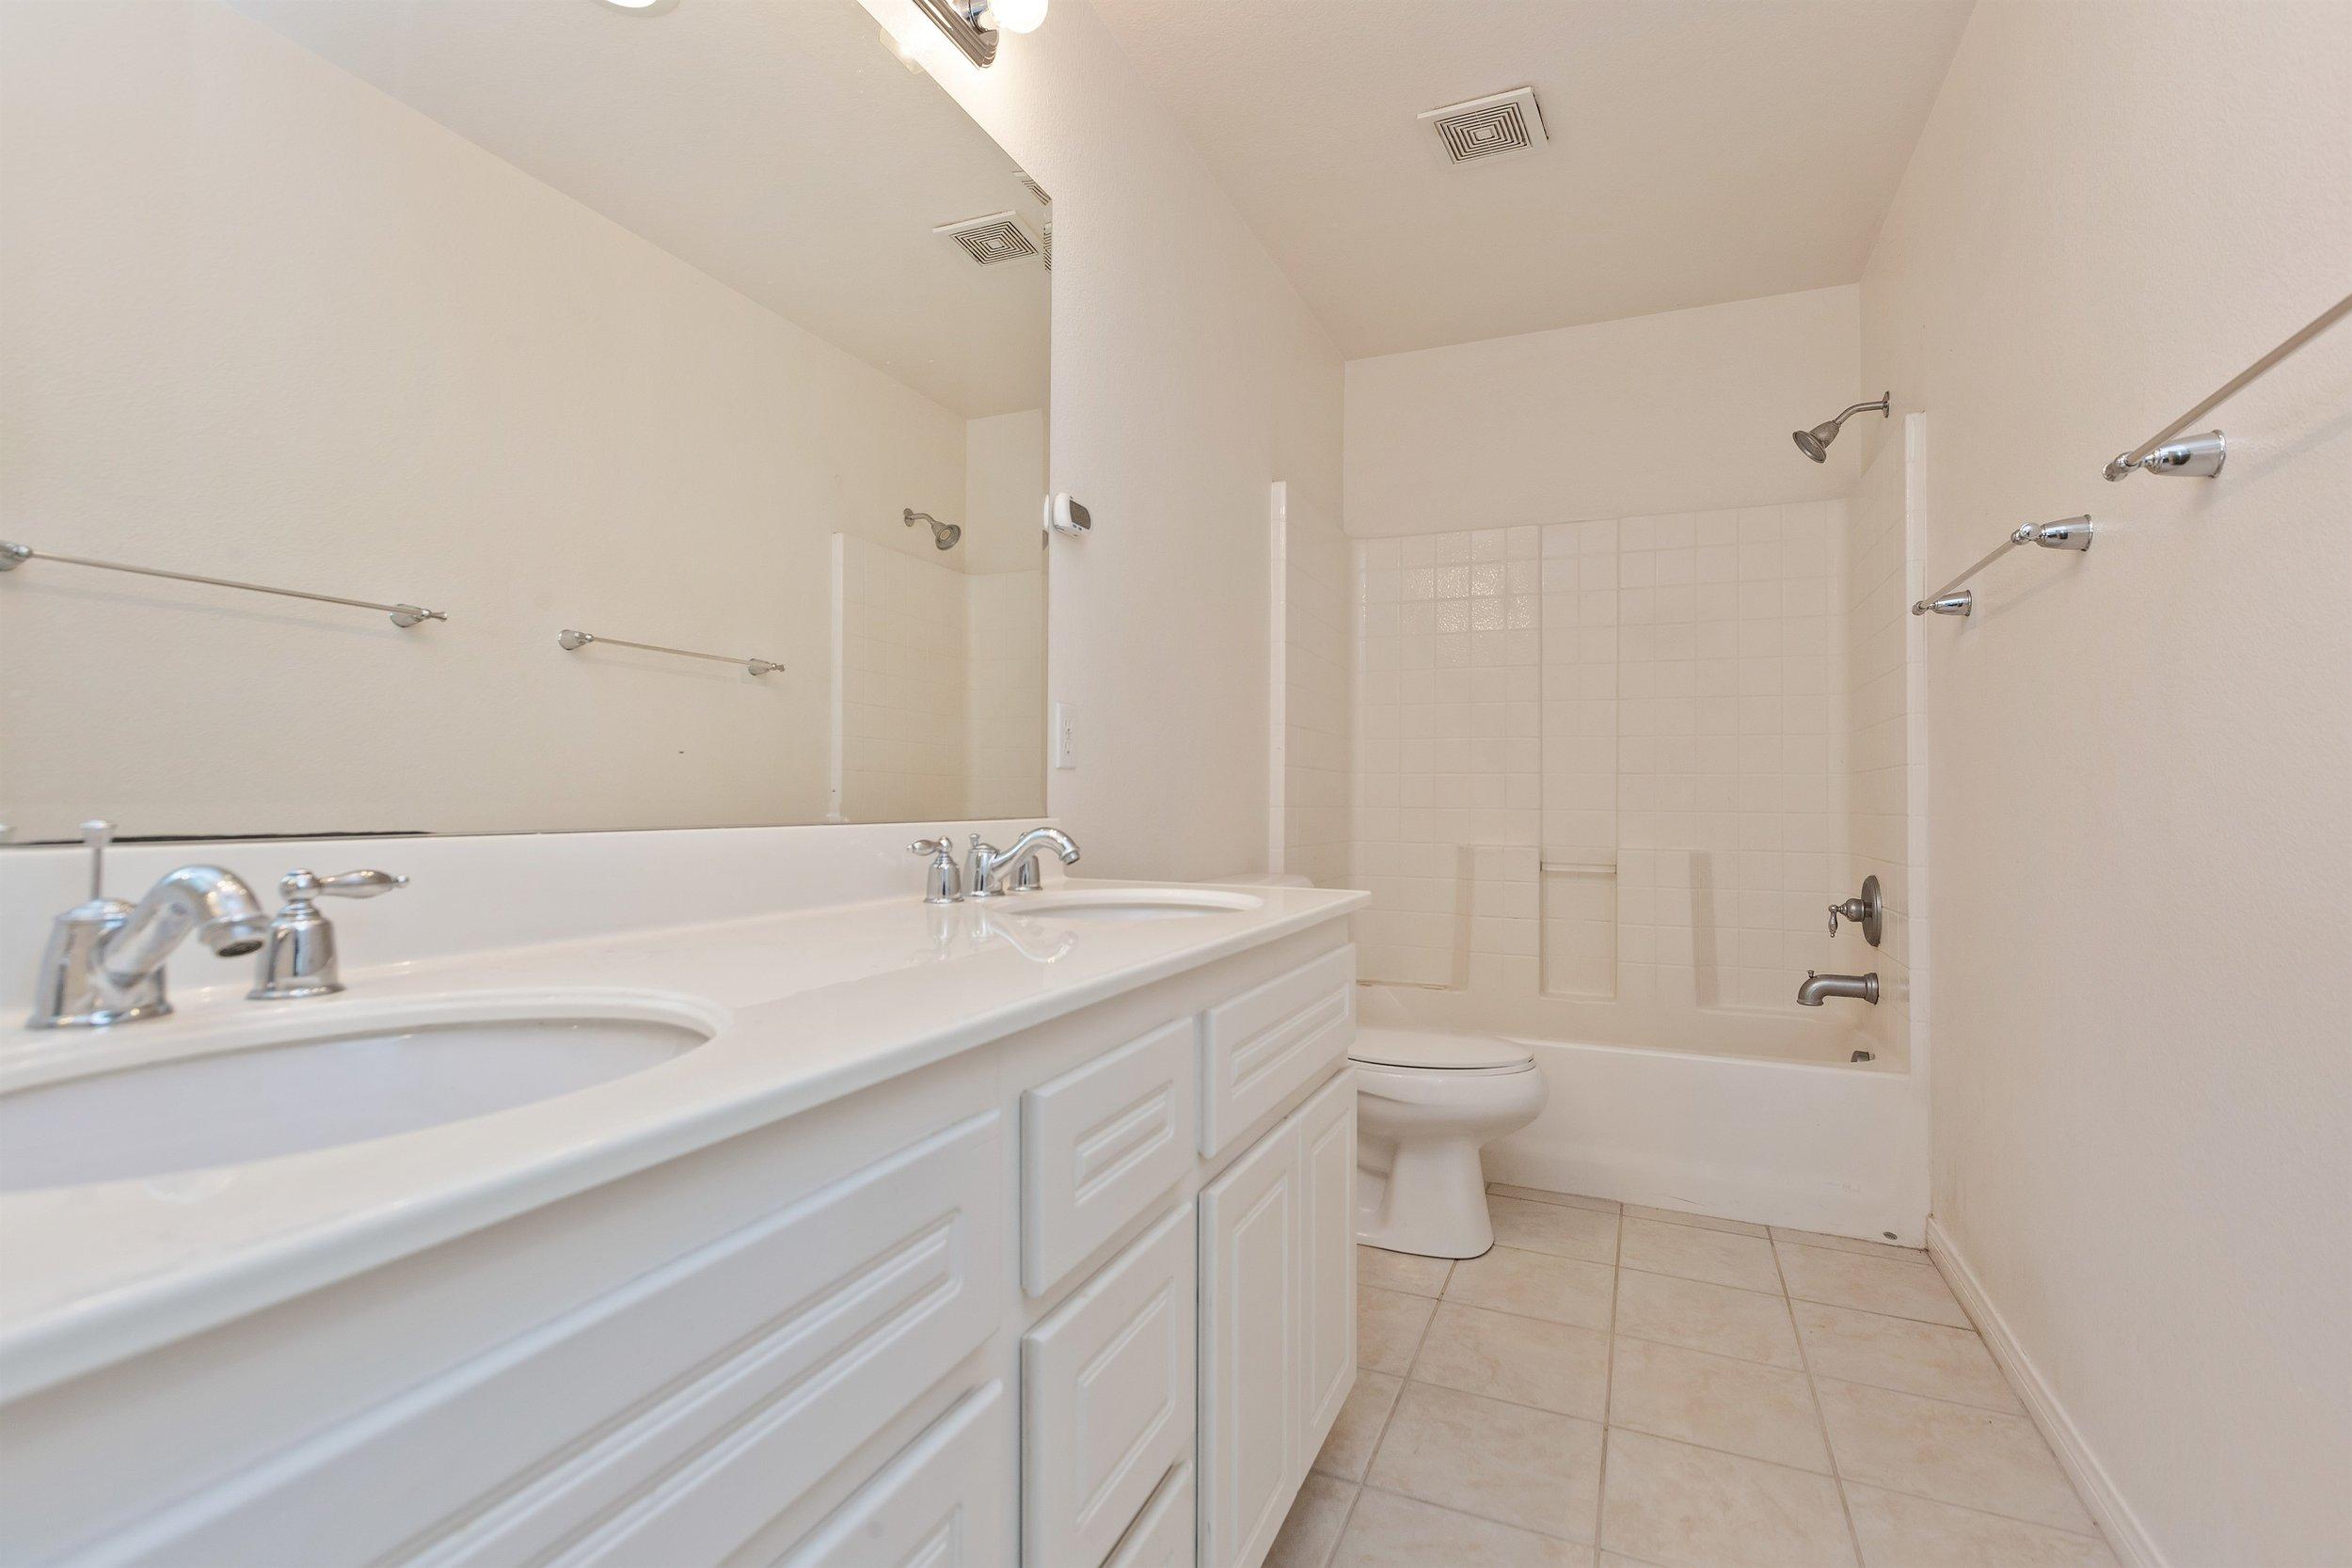 021_Bathroom.jpg